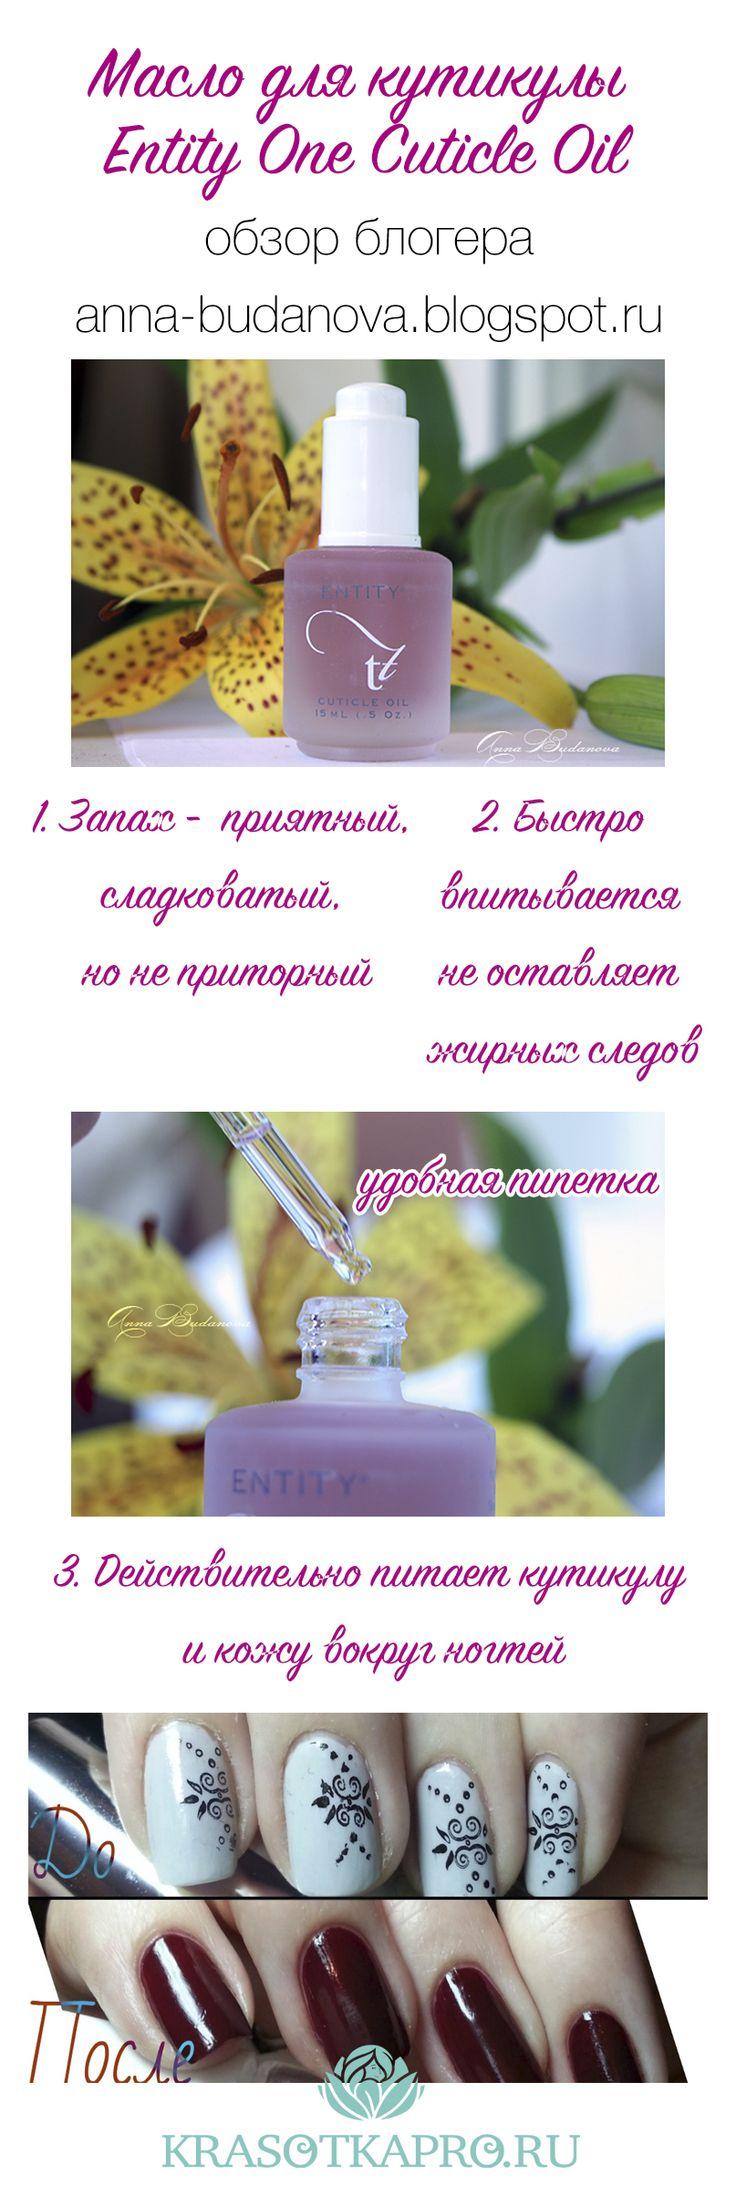 Масло для кутикулы и ногтей Color Couture Entity One Cuticle Oil http://www.krasotkapro.ru/catalog/sredstva_dlya_kutikuly/color_couture_entity_one_cuticle_oil_15_ml/. Ask how by KrasotkaPro. #Аккуратный #Красивый #Маникюр #КрасоткаПро #Ногти #Уход #Кутикула